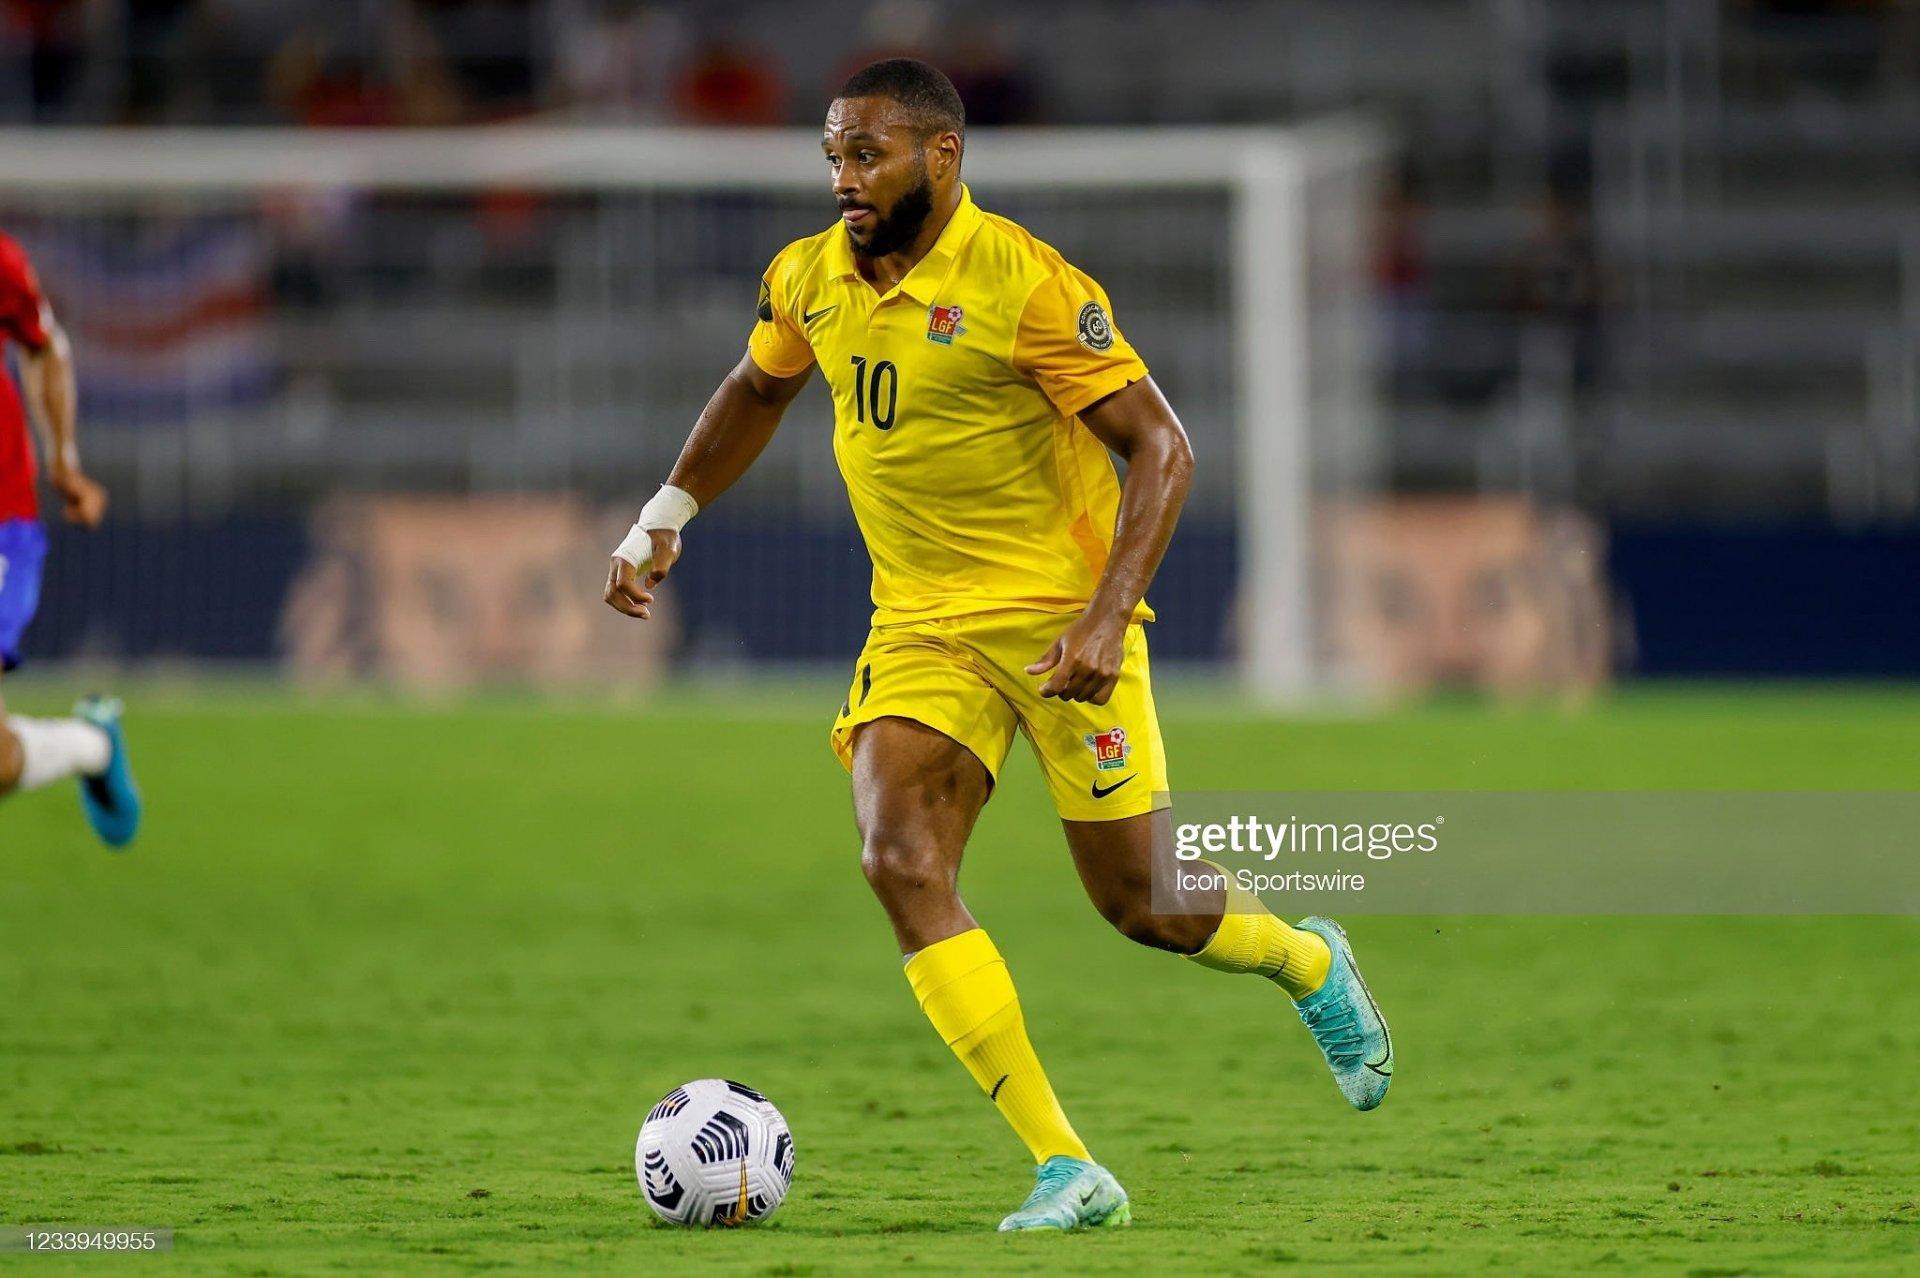 Trực tiếp Jamaica vs Guadeloupe, cập nhật link xem trực tiếp Jamaica vs Guadeloupe, 05h30 ngày 17/07 1